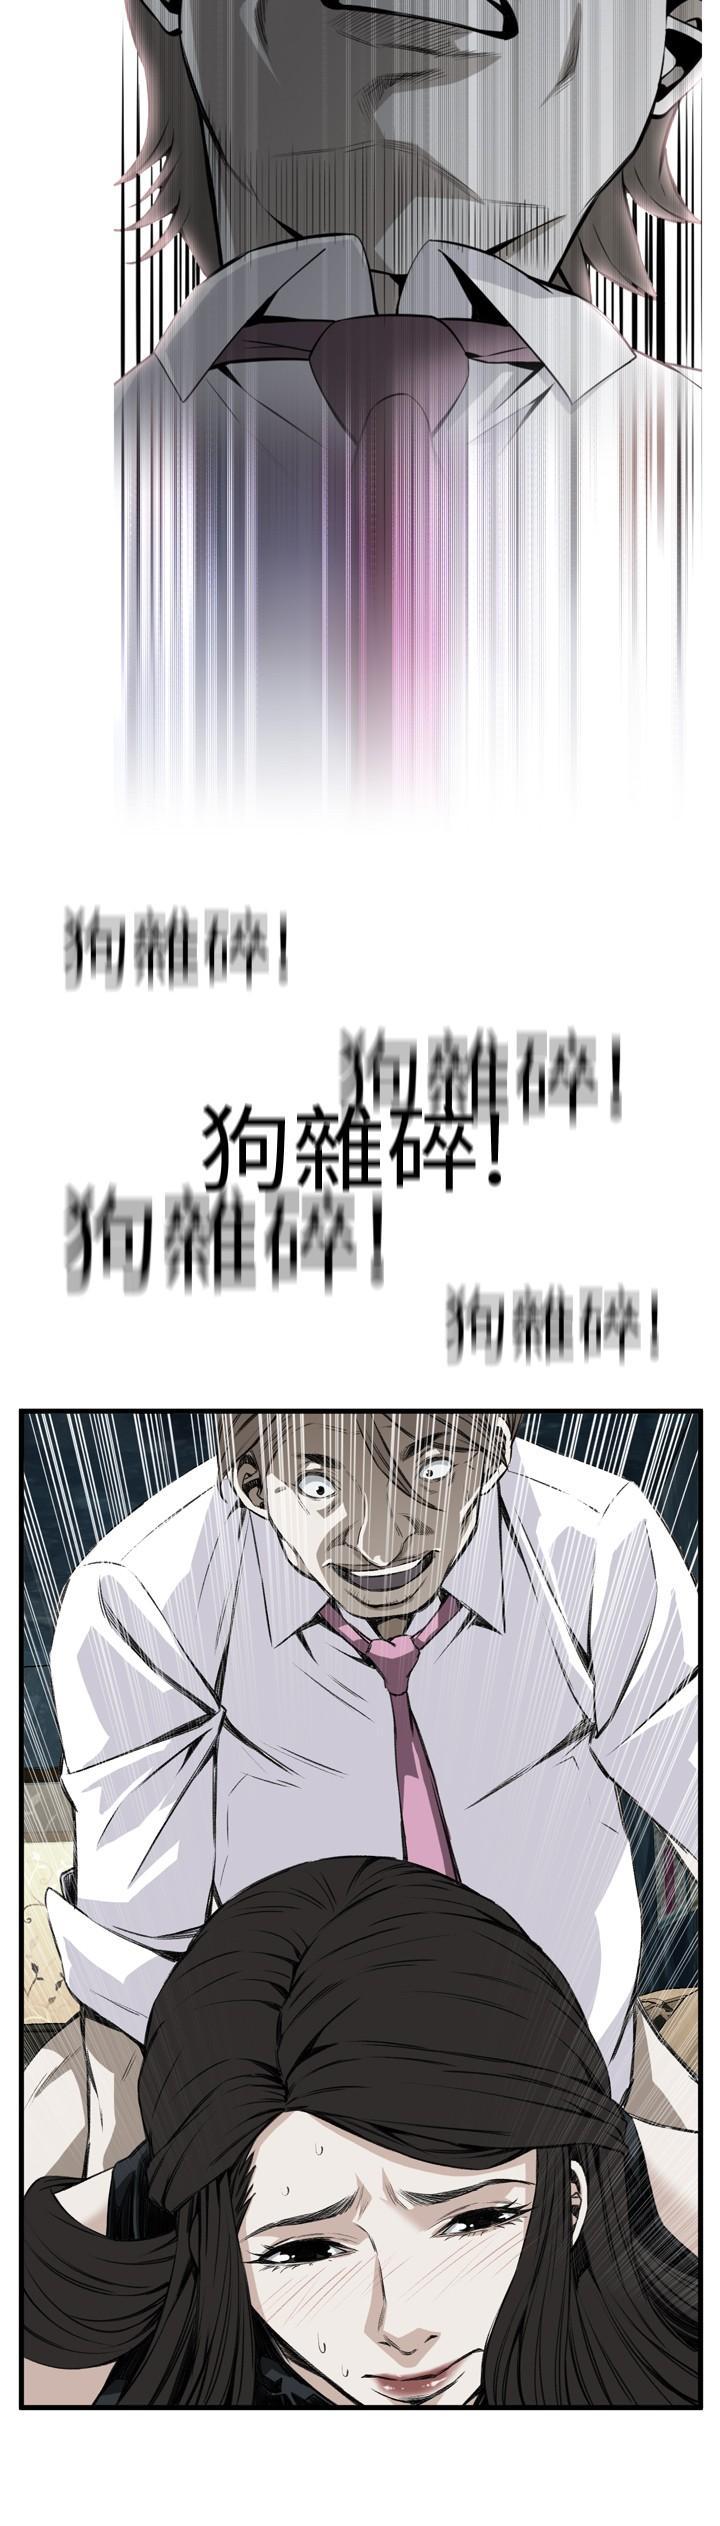 Take a Peek 偷窥 Ch.39~55 [Chinese]中文 189